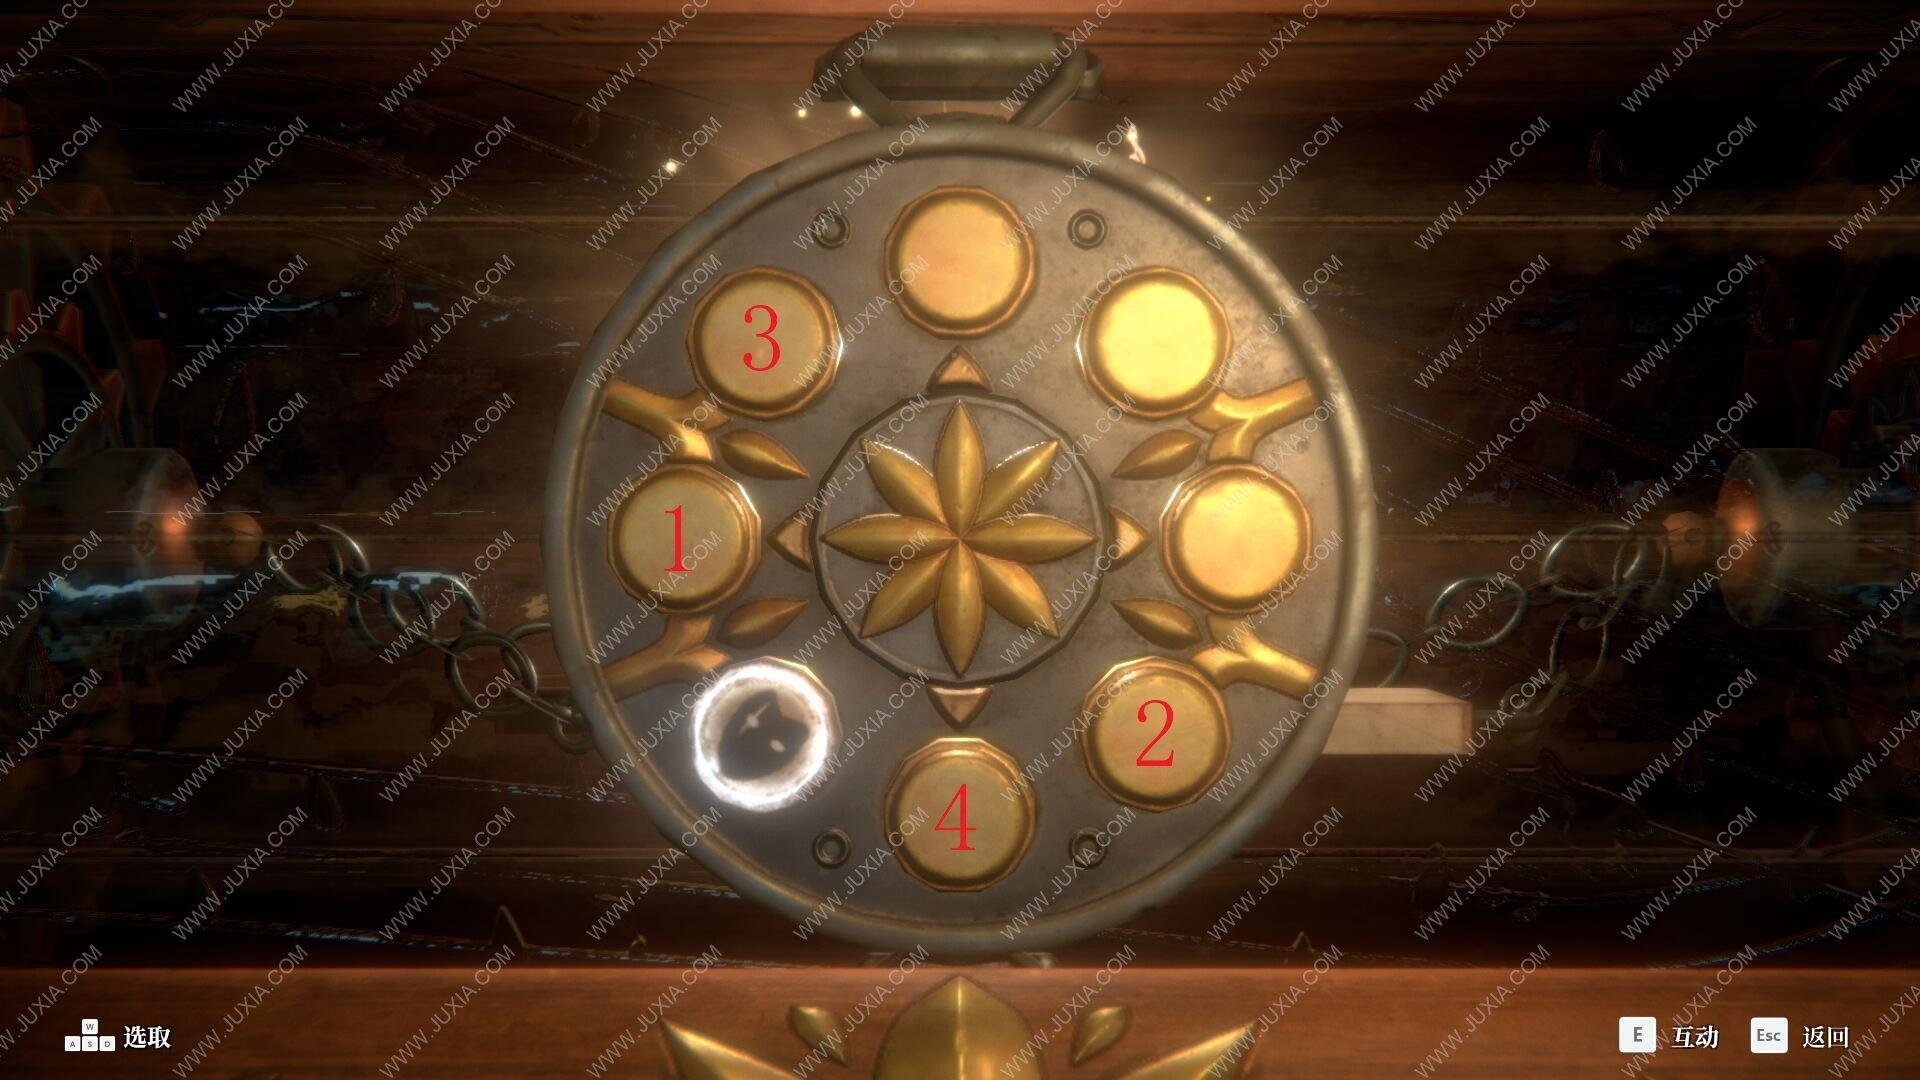 deemo黄金乐谱收集攻略 古树旋律阁楼圆盘按钮顺序